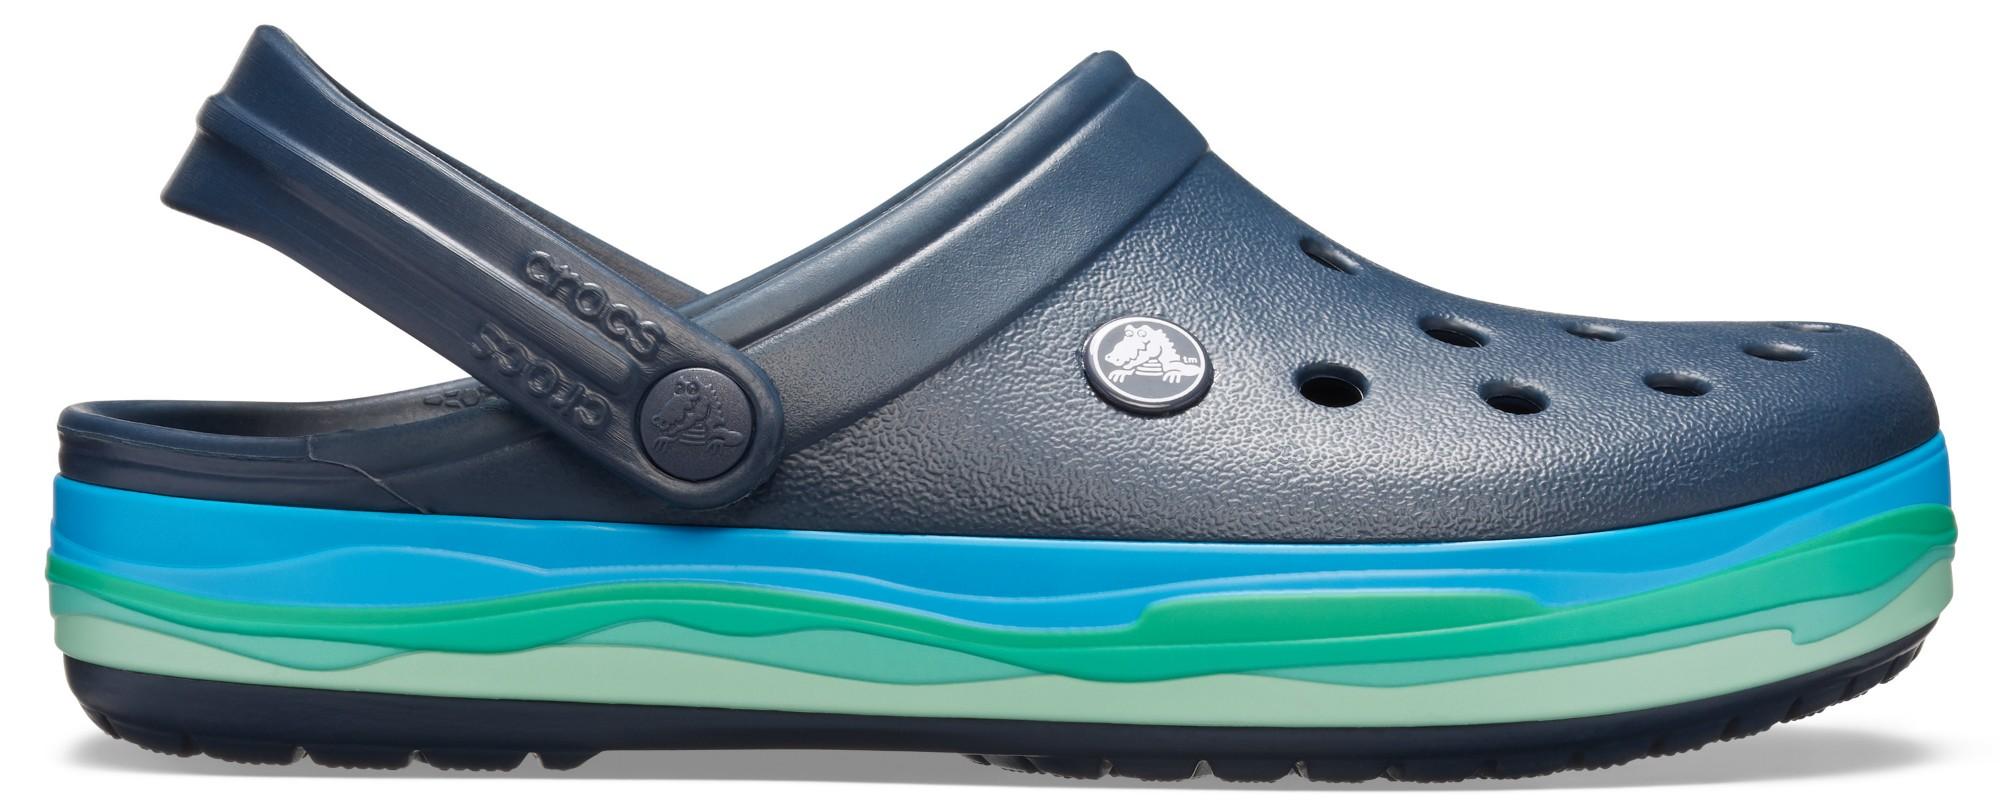 Crocs™ Crocband Wavy Band Clog Navy/Multi 38,5